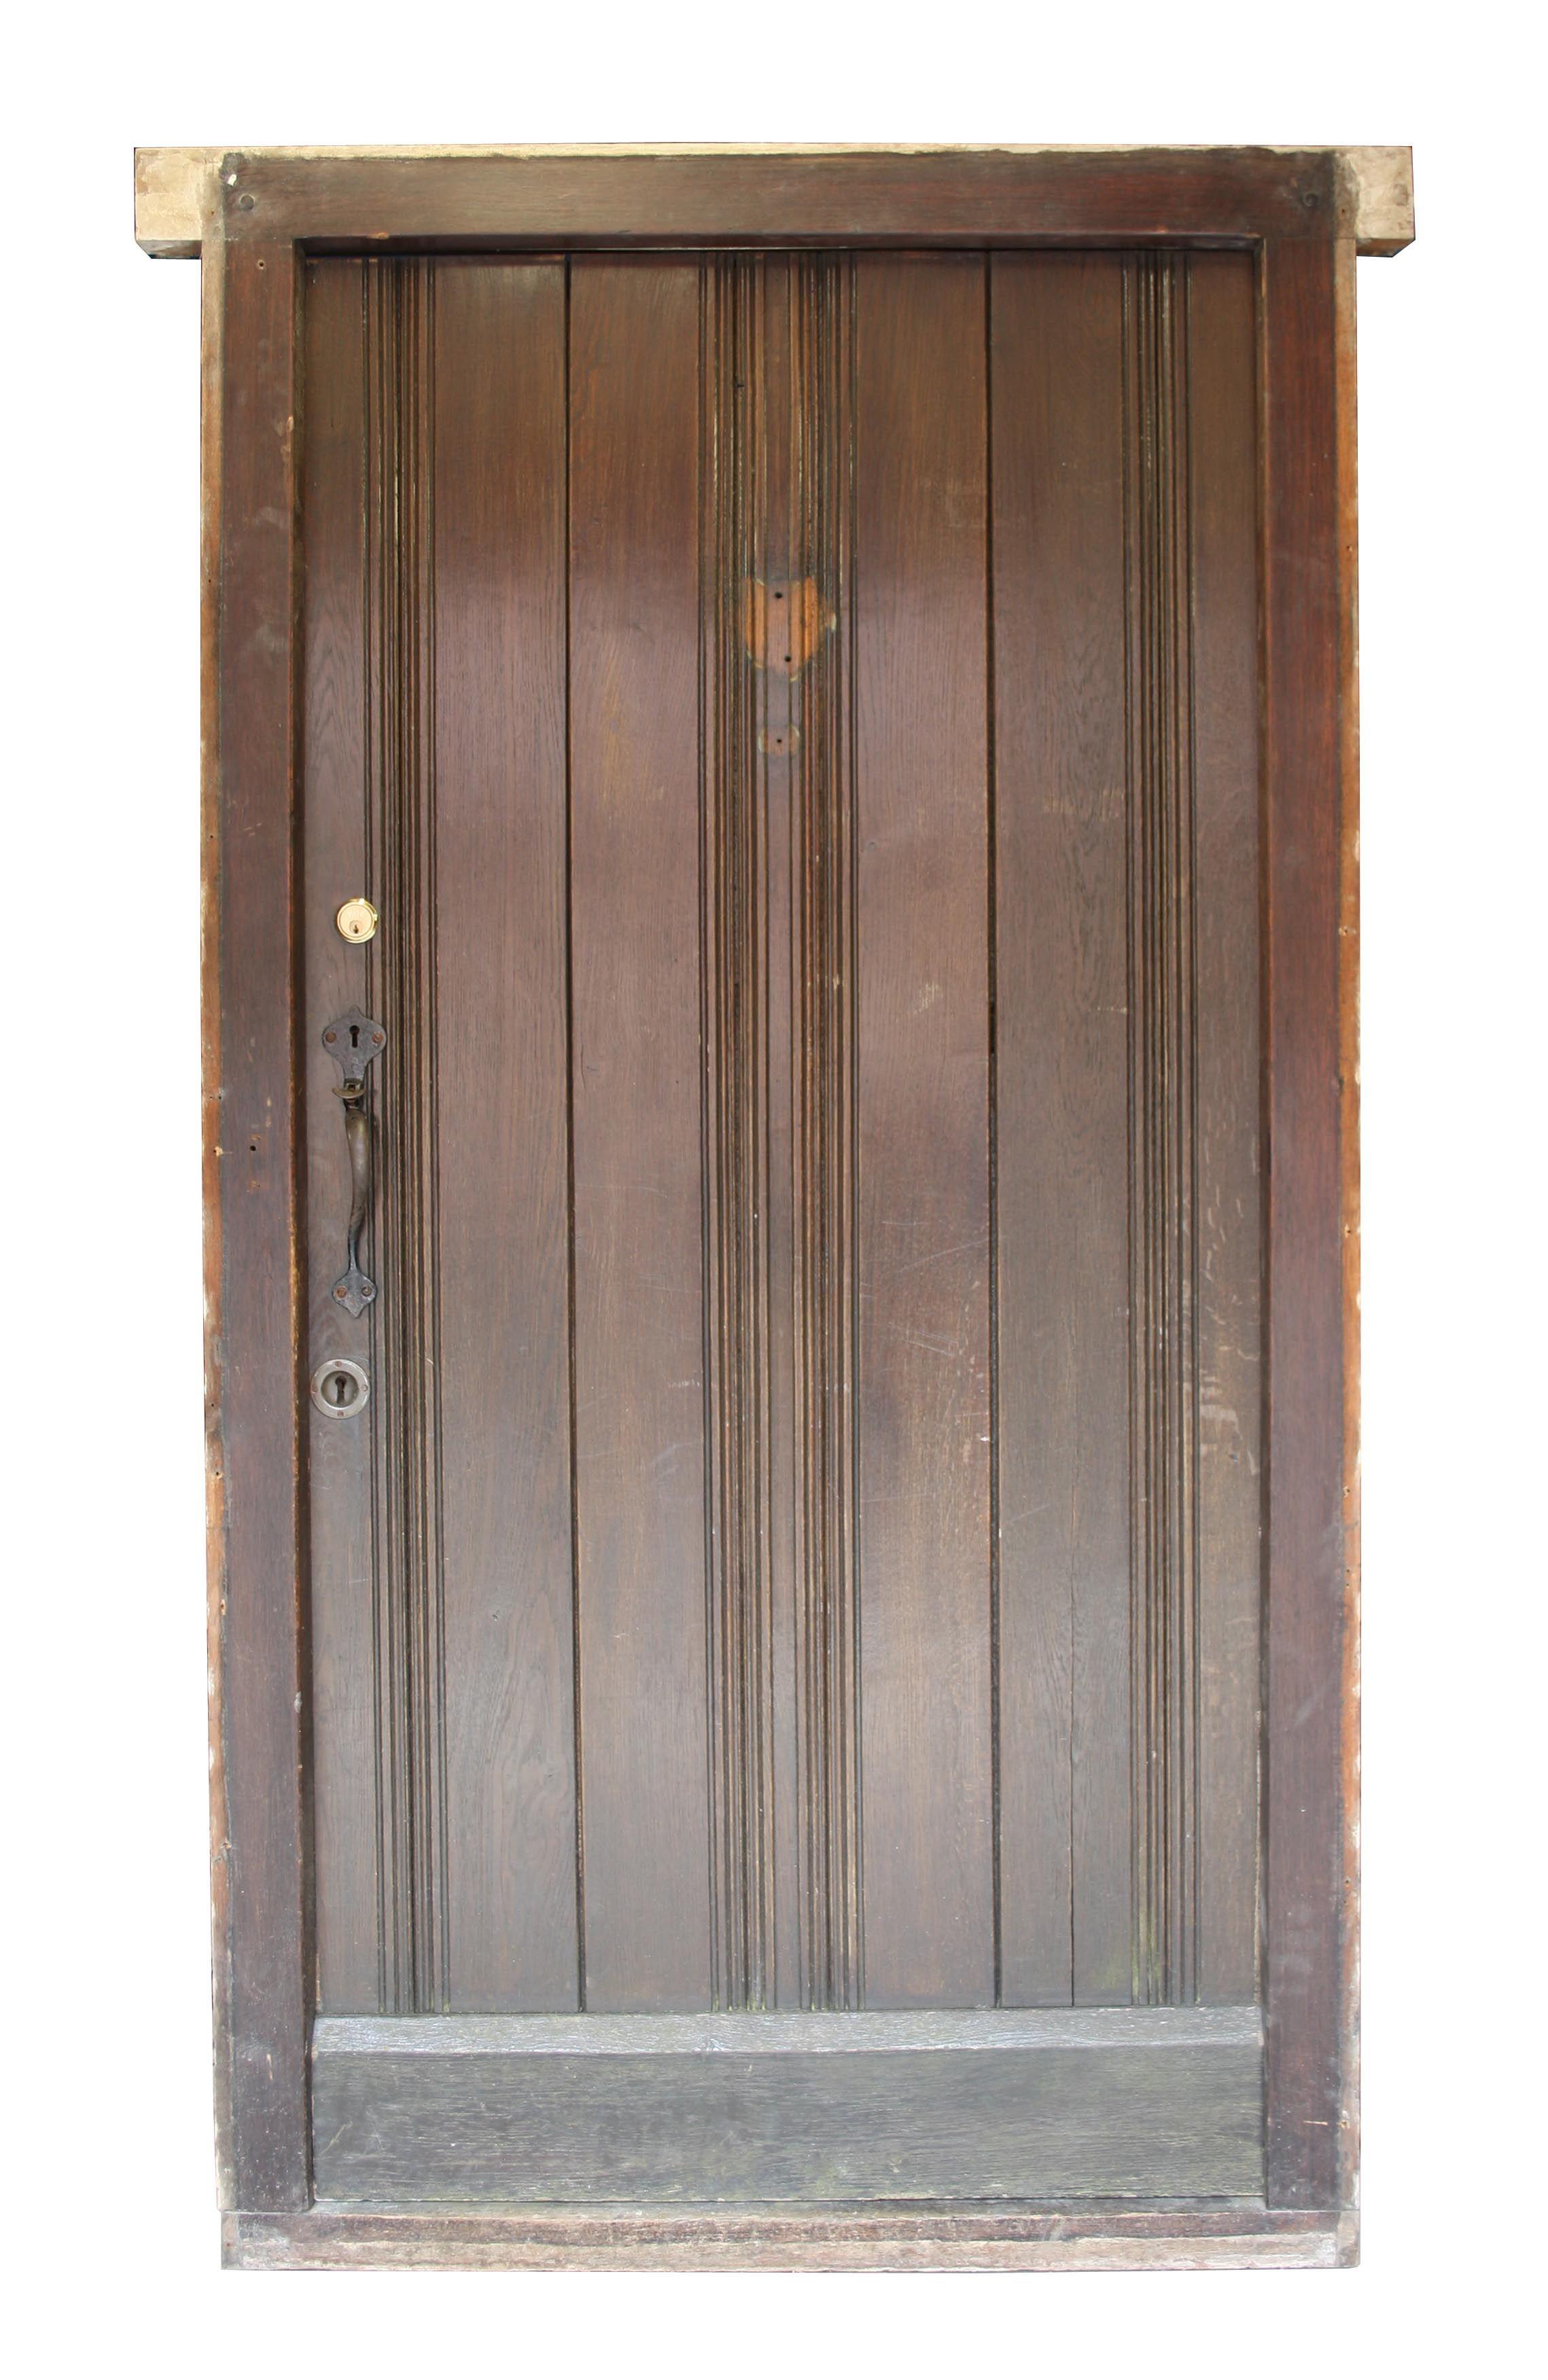 Solid Oak Front Door With Frame C 1910 Uk Architectural Heritage